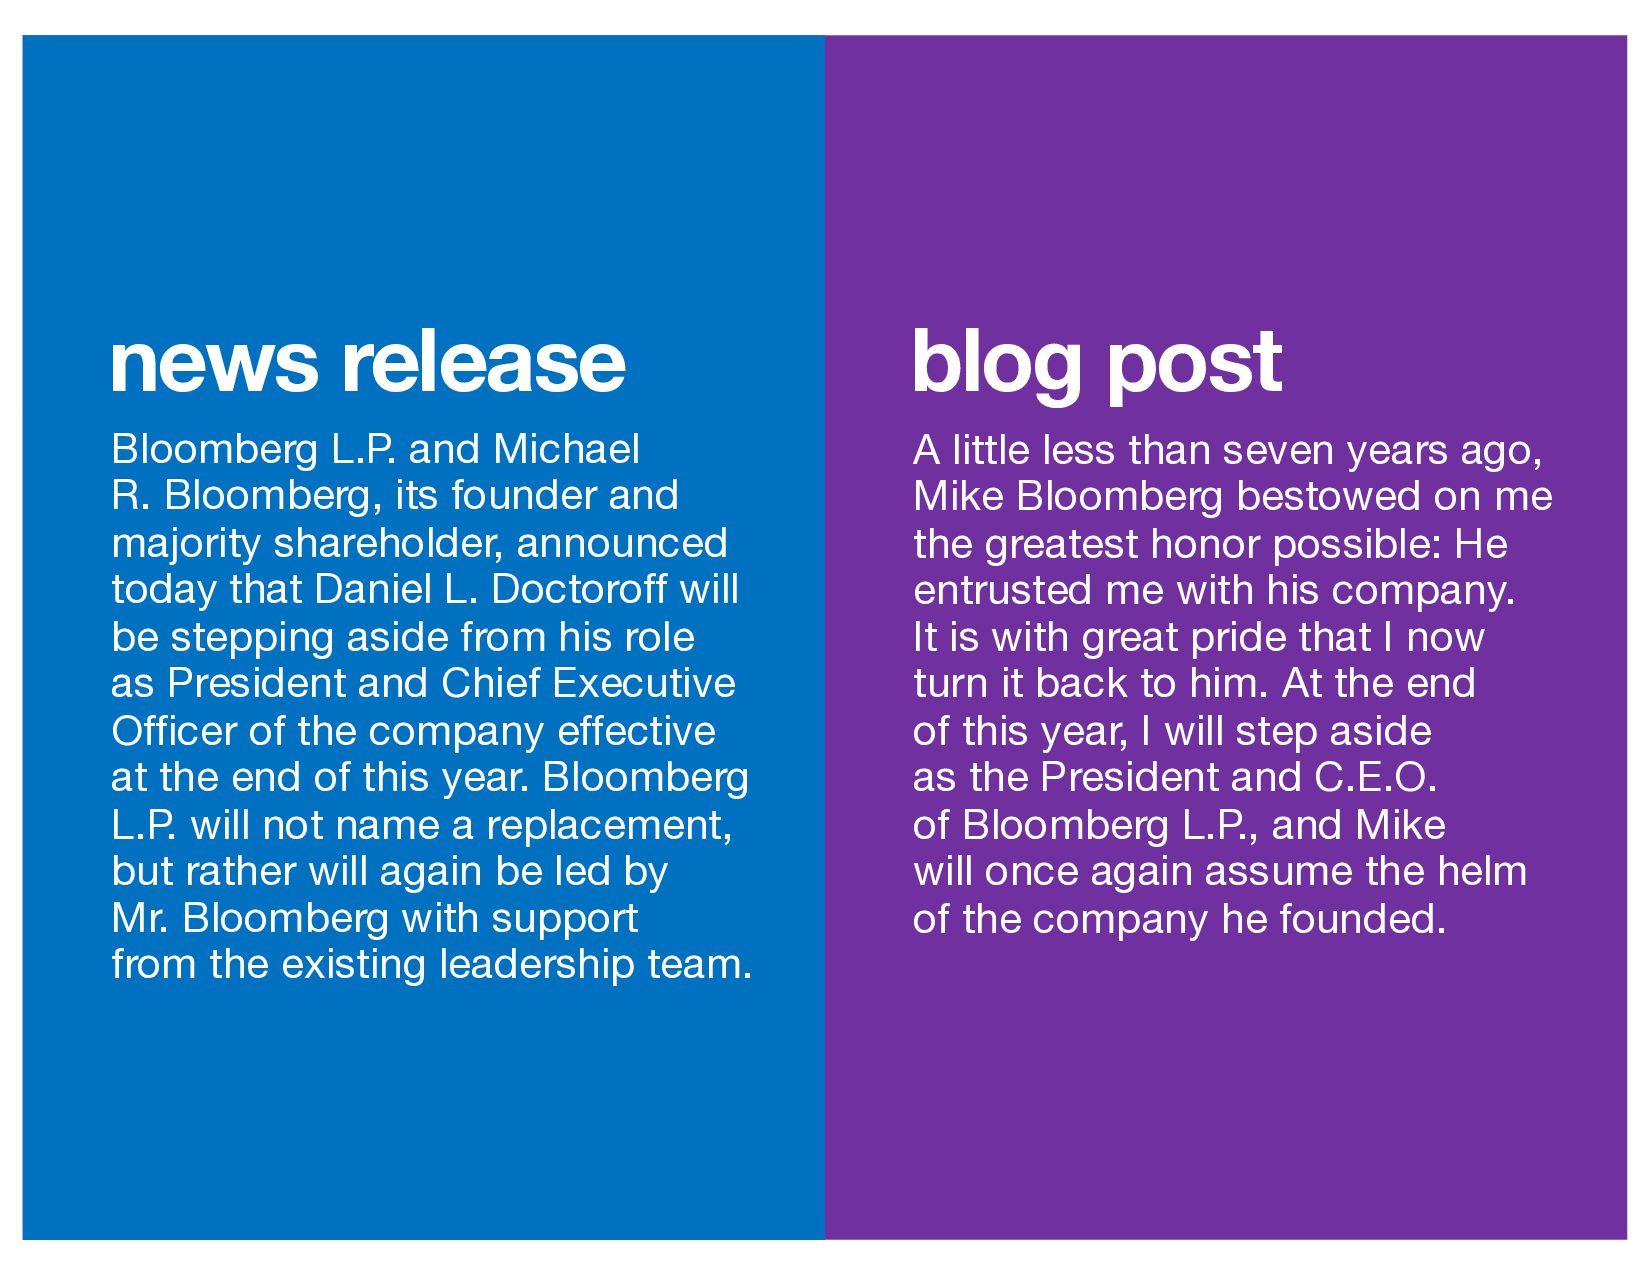 """Good."""